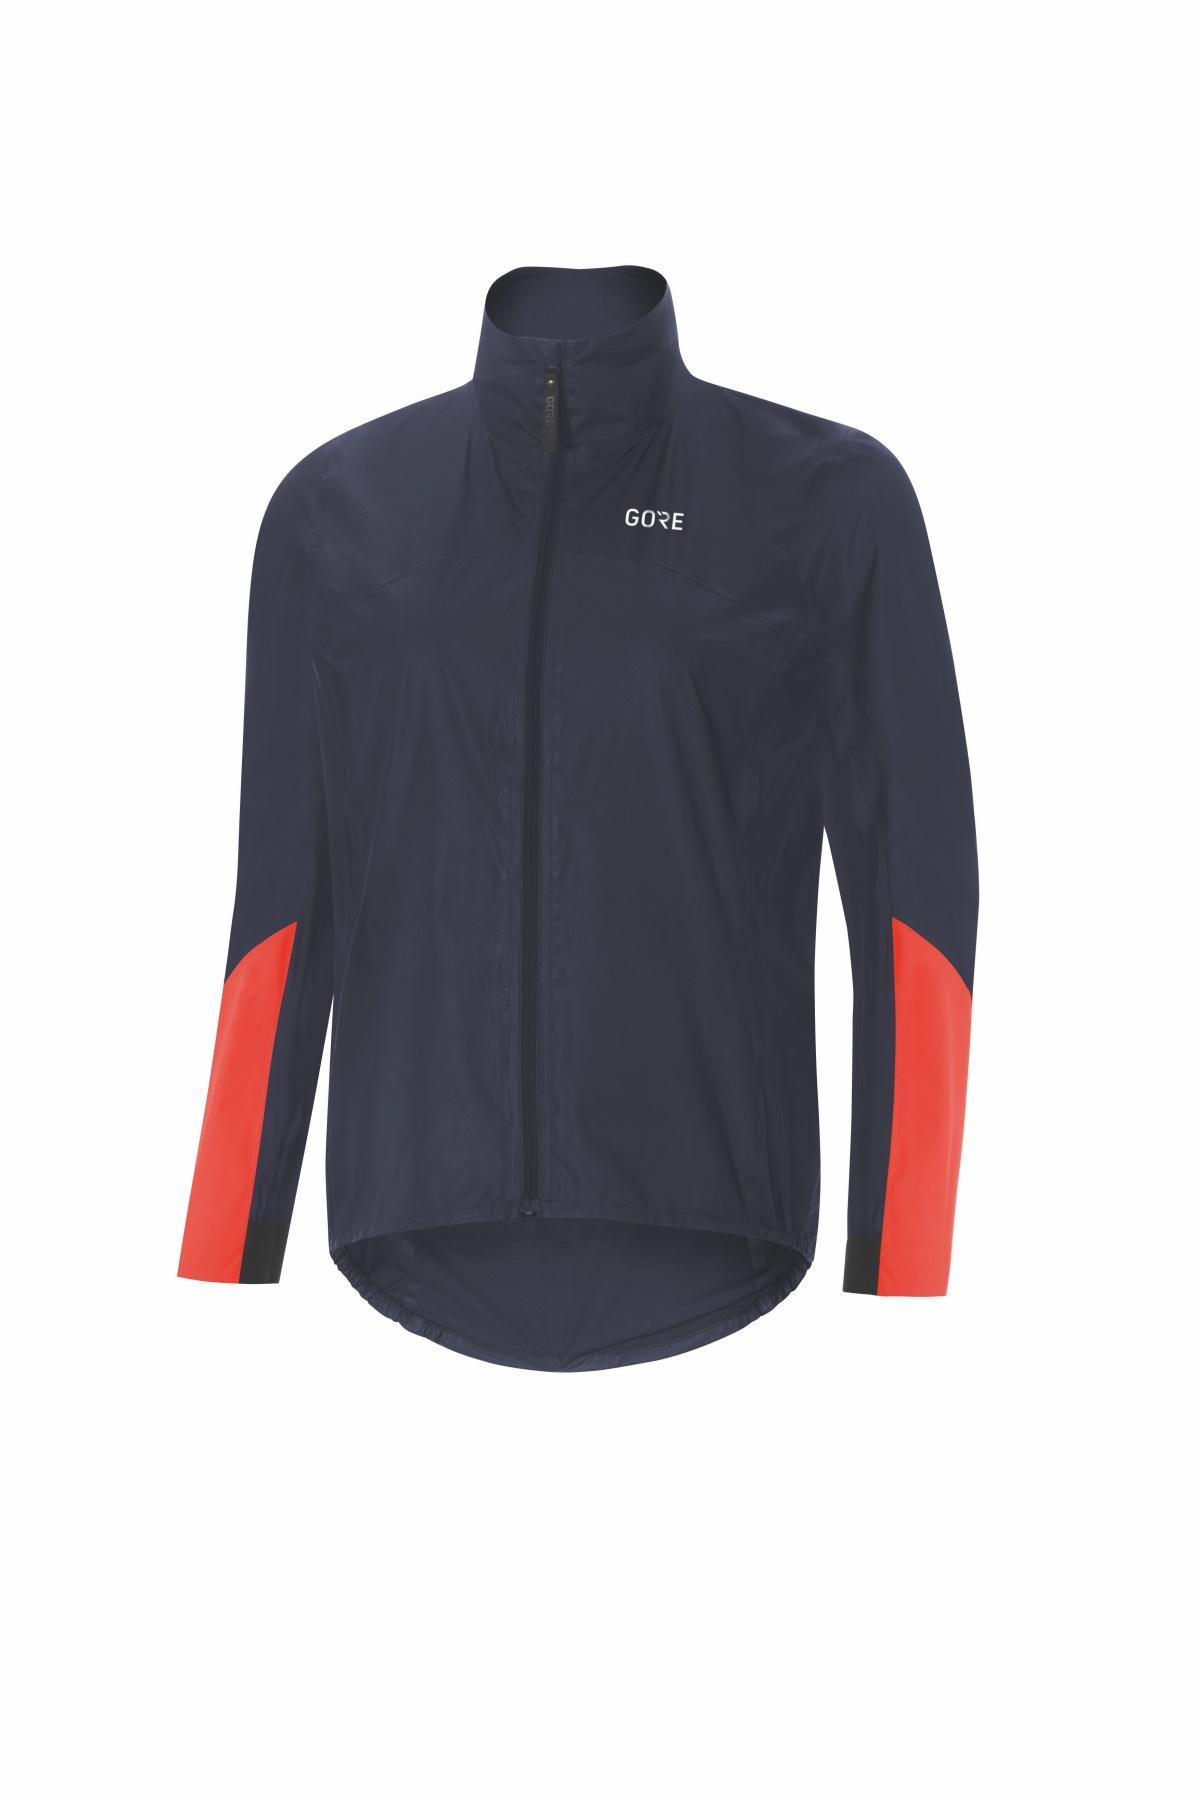 GORE GORE-TEX Shakedry jacket